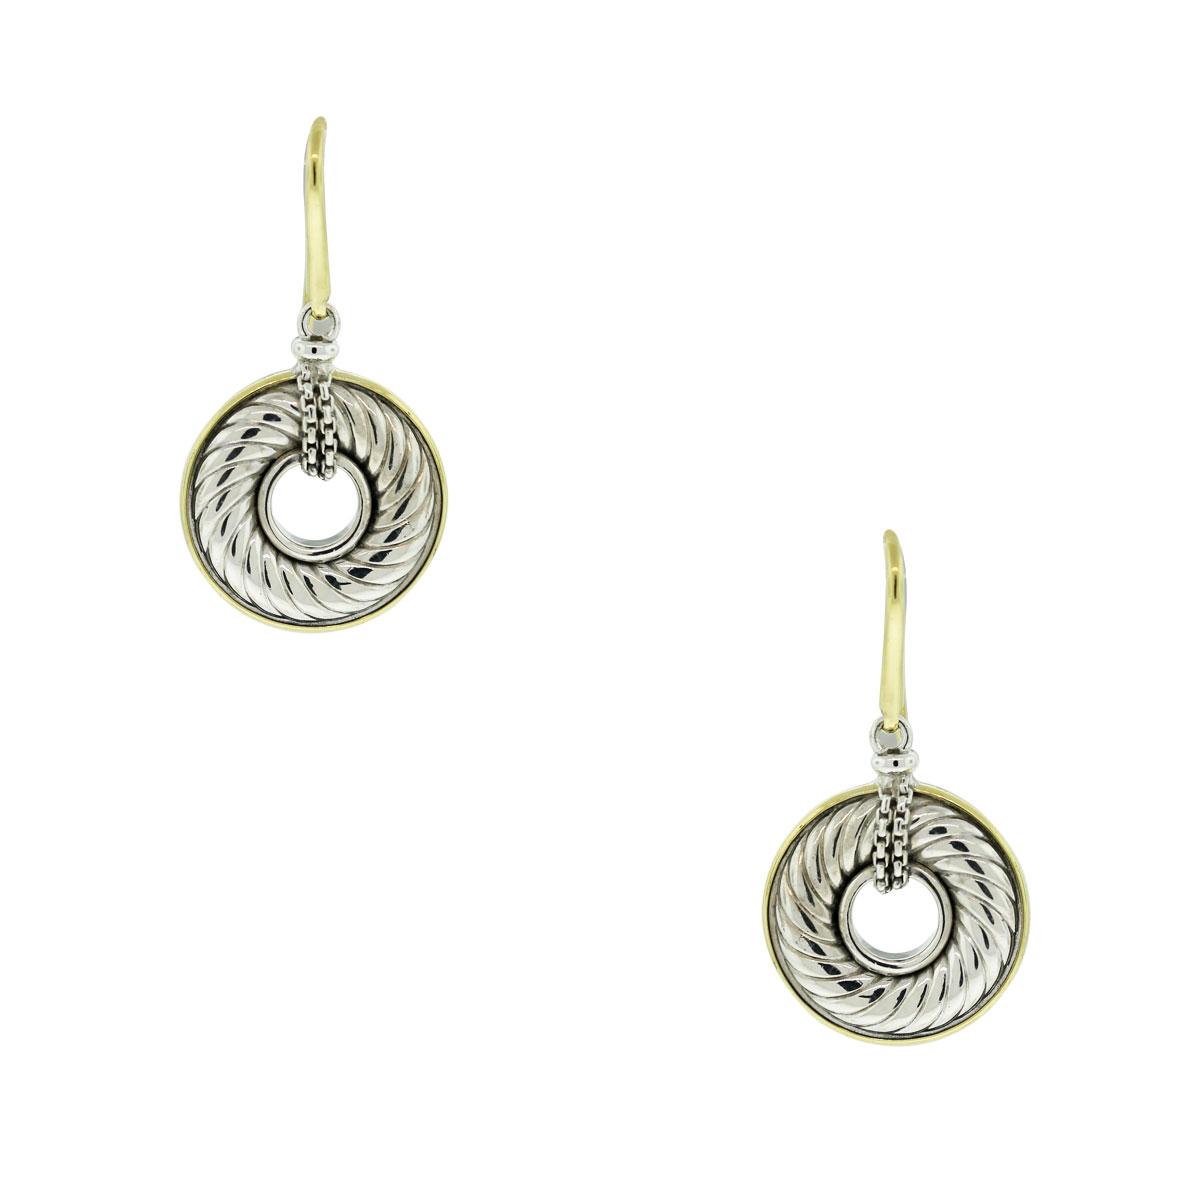 David Yurman Sterling Silver 18k Yellow Gold Disc Earrings